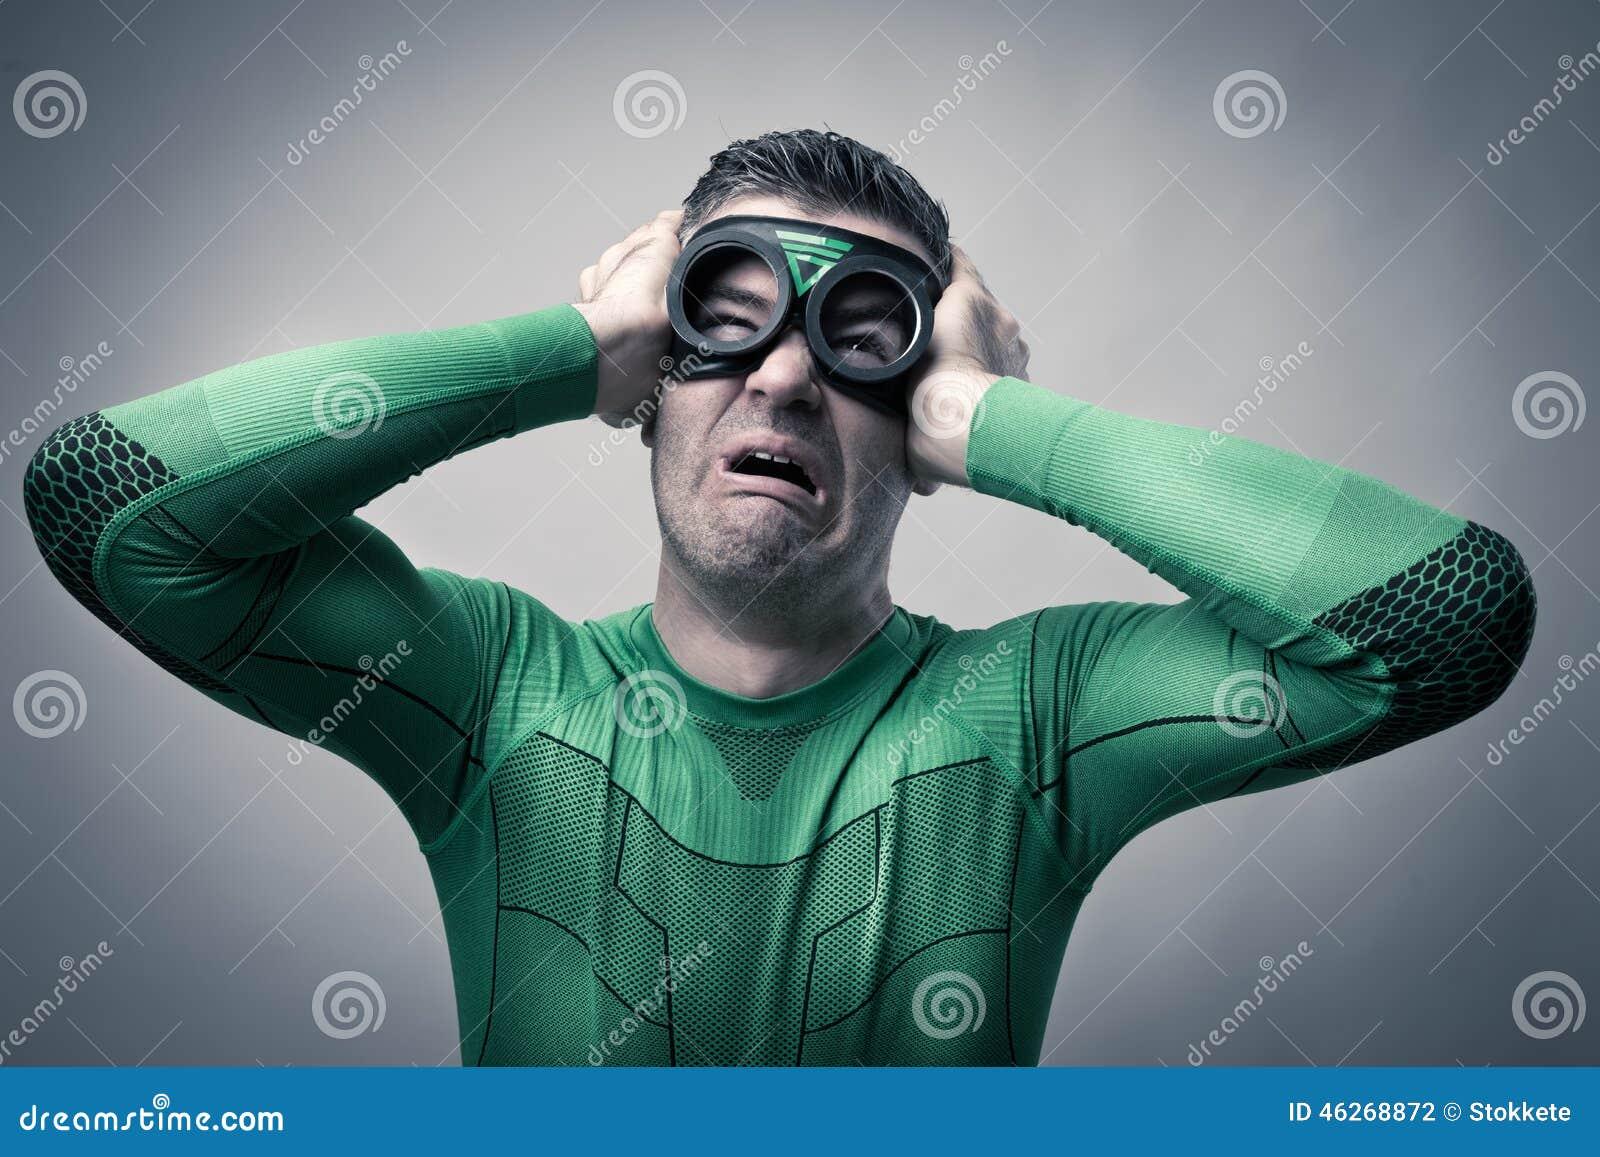 Au77 Doctor Strange Hero Illustration Art: Superhero With Bad Headache Stock Photo